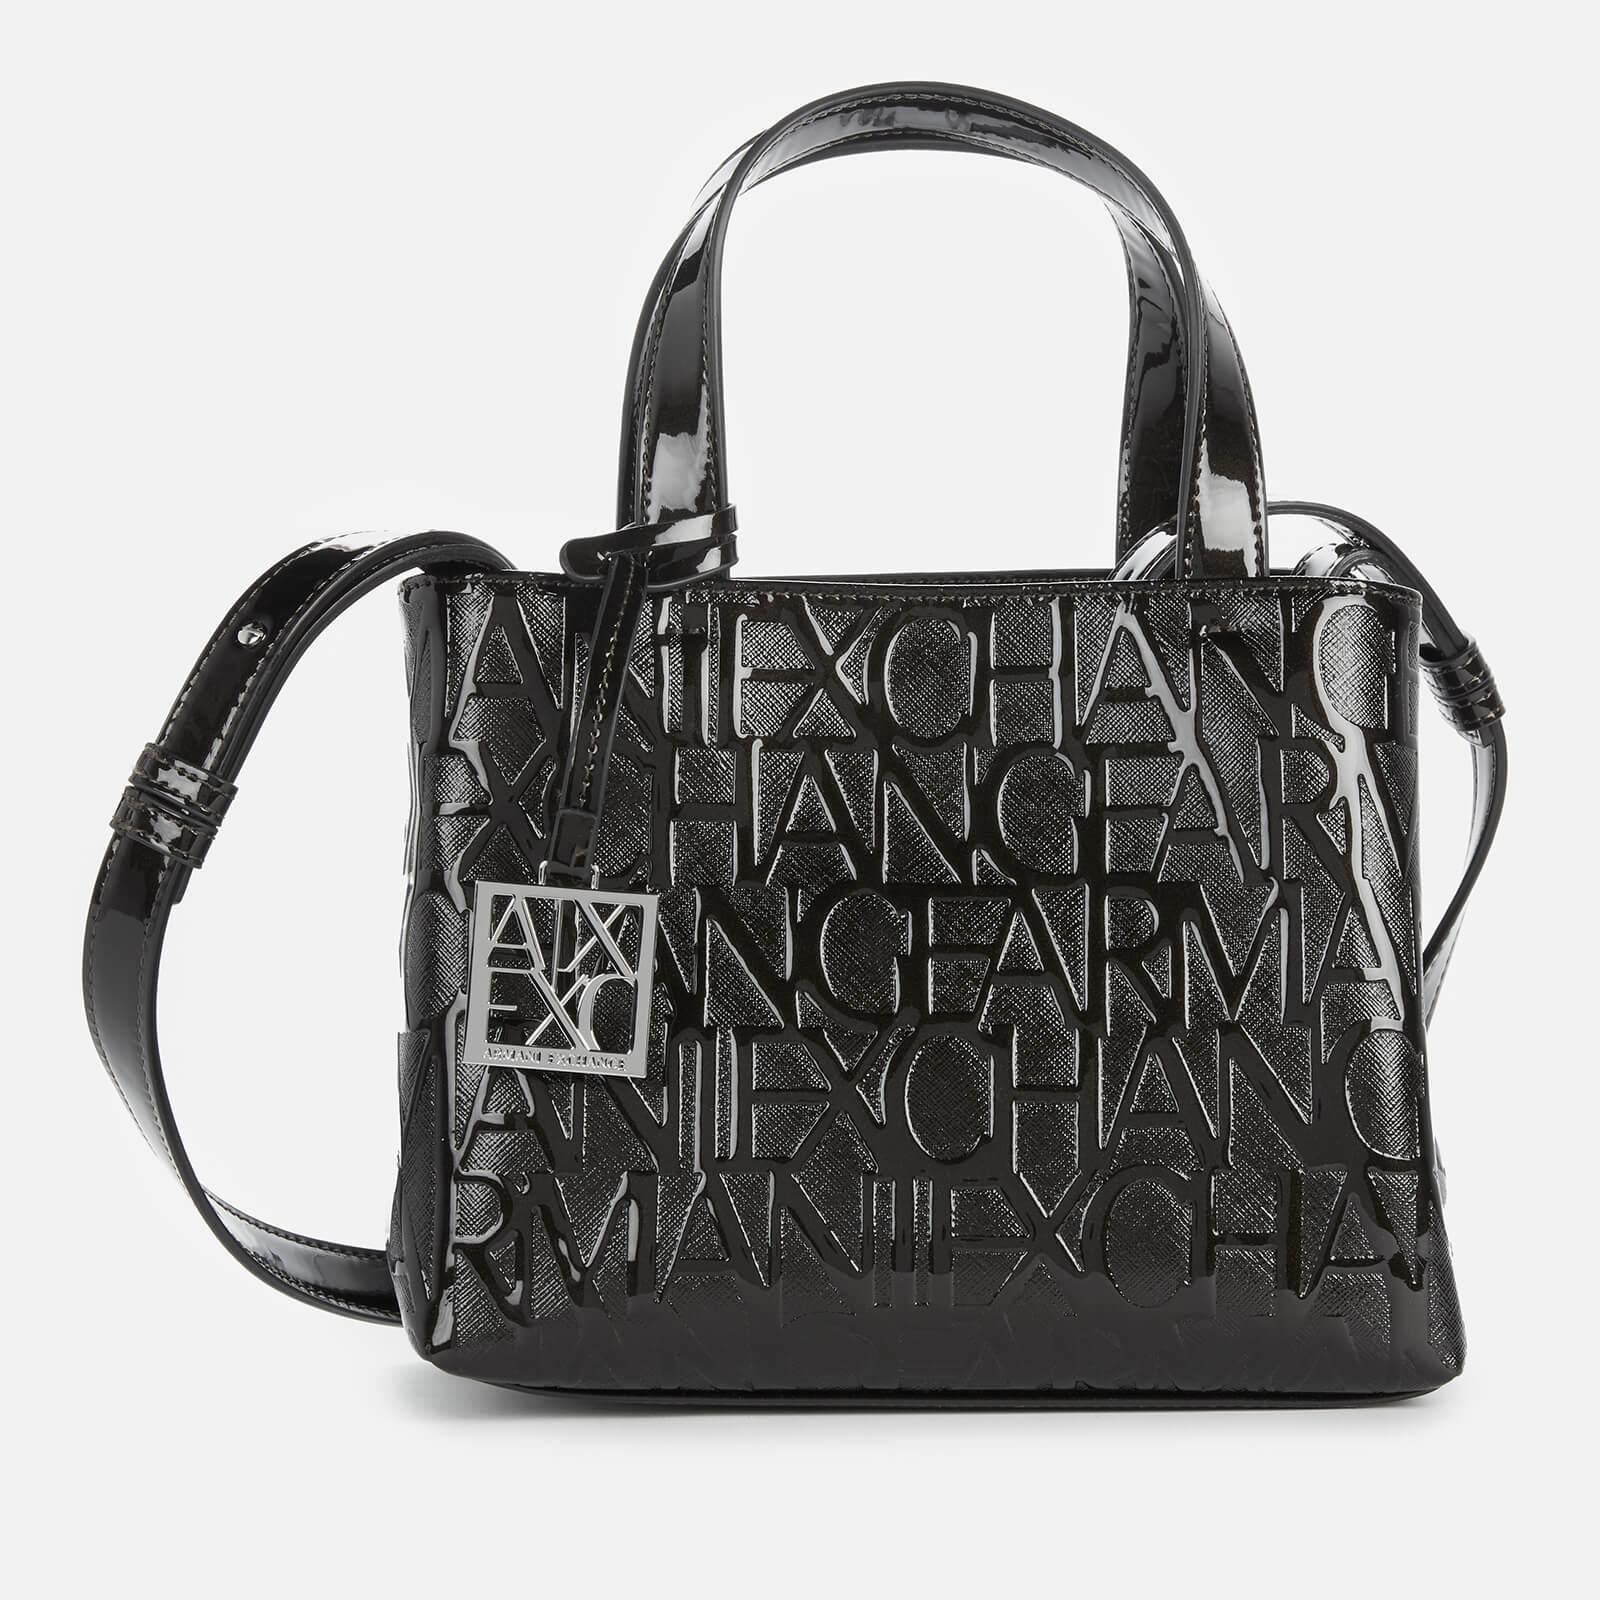 Armani Exchange Women's Liz Small Tote Bag - Black